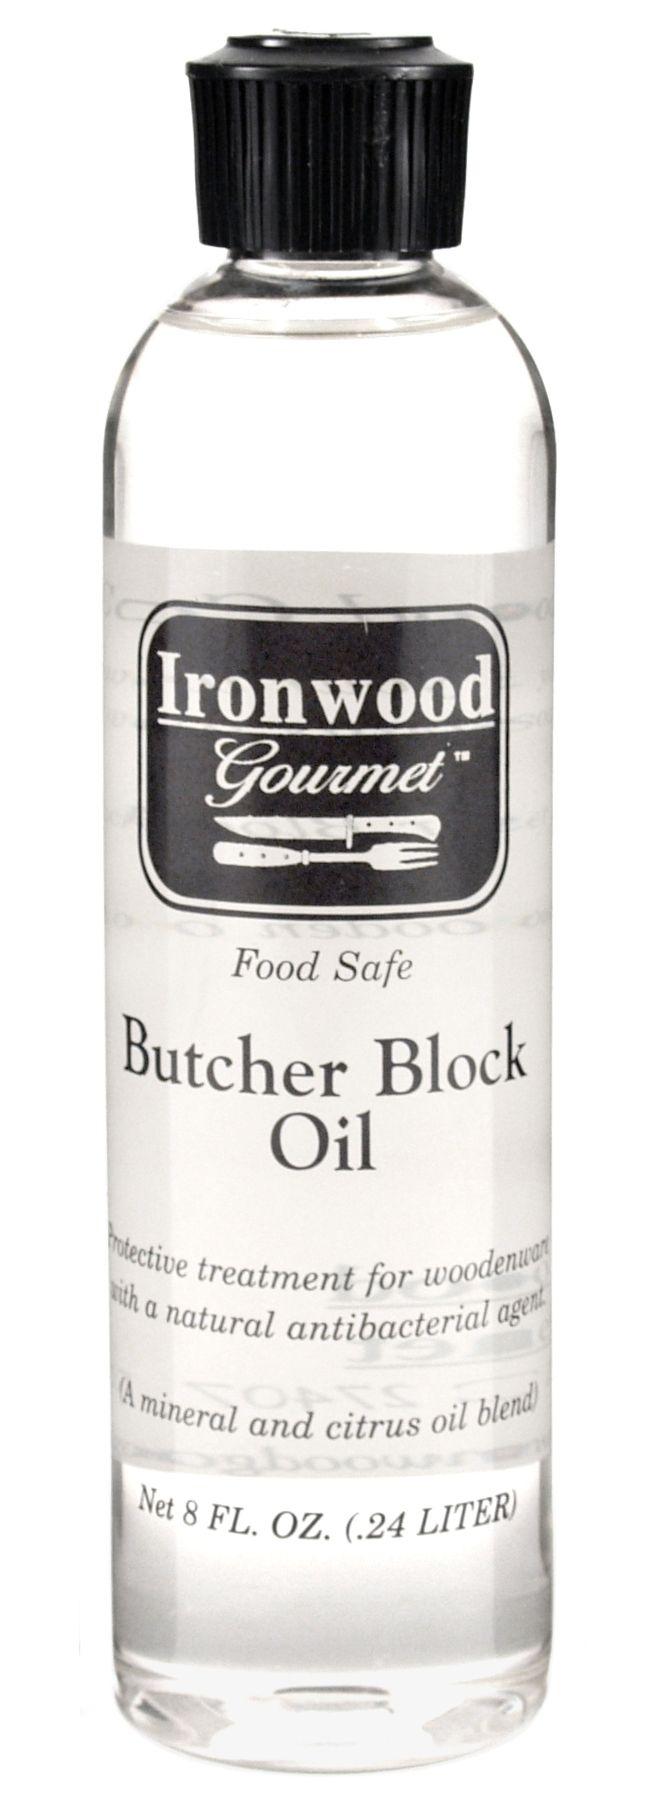 Ironwood Gourmet Antibacterial Butcher Block Oil